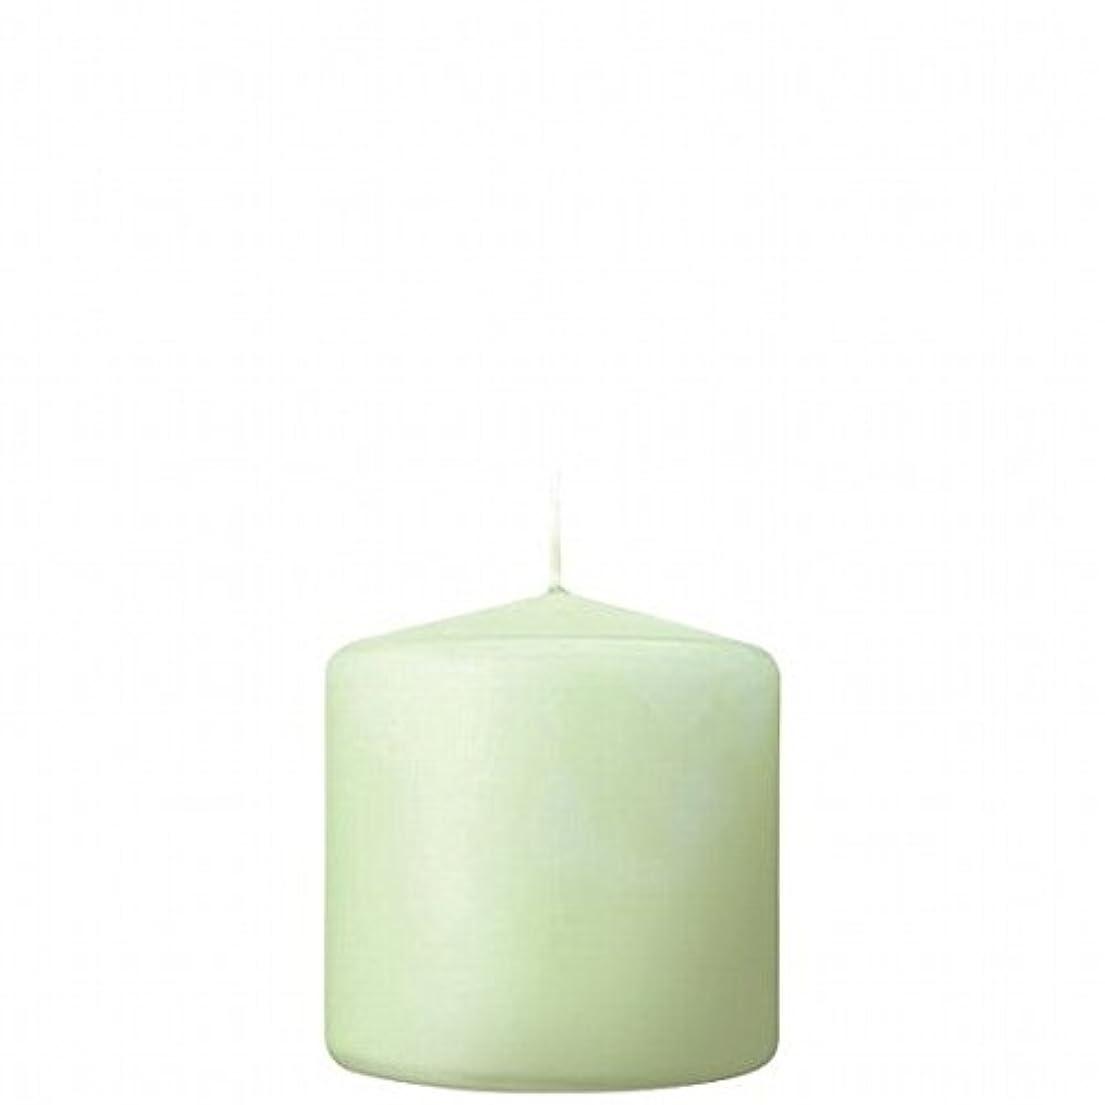 kameyama candle(カメヤマキャンドル) 3×3ベルトップピラーキャンドル 「 ホワイトグリーン 」(A9730000WG)